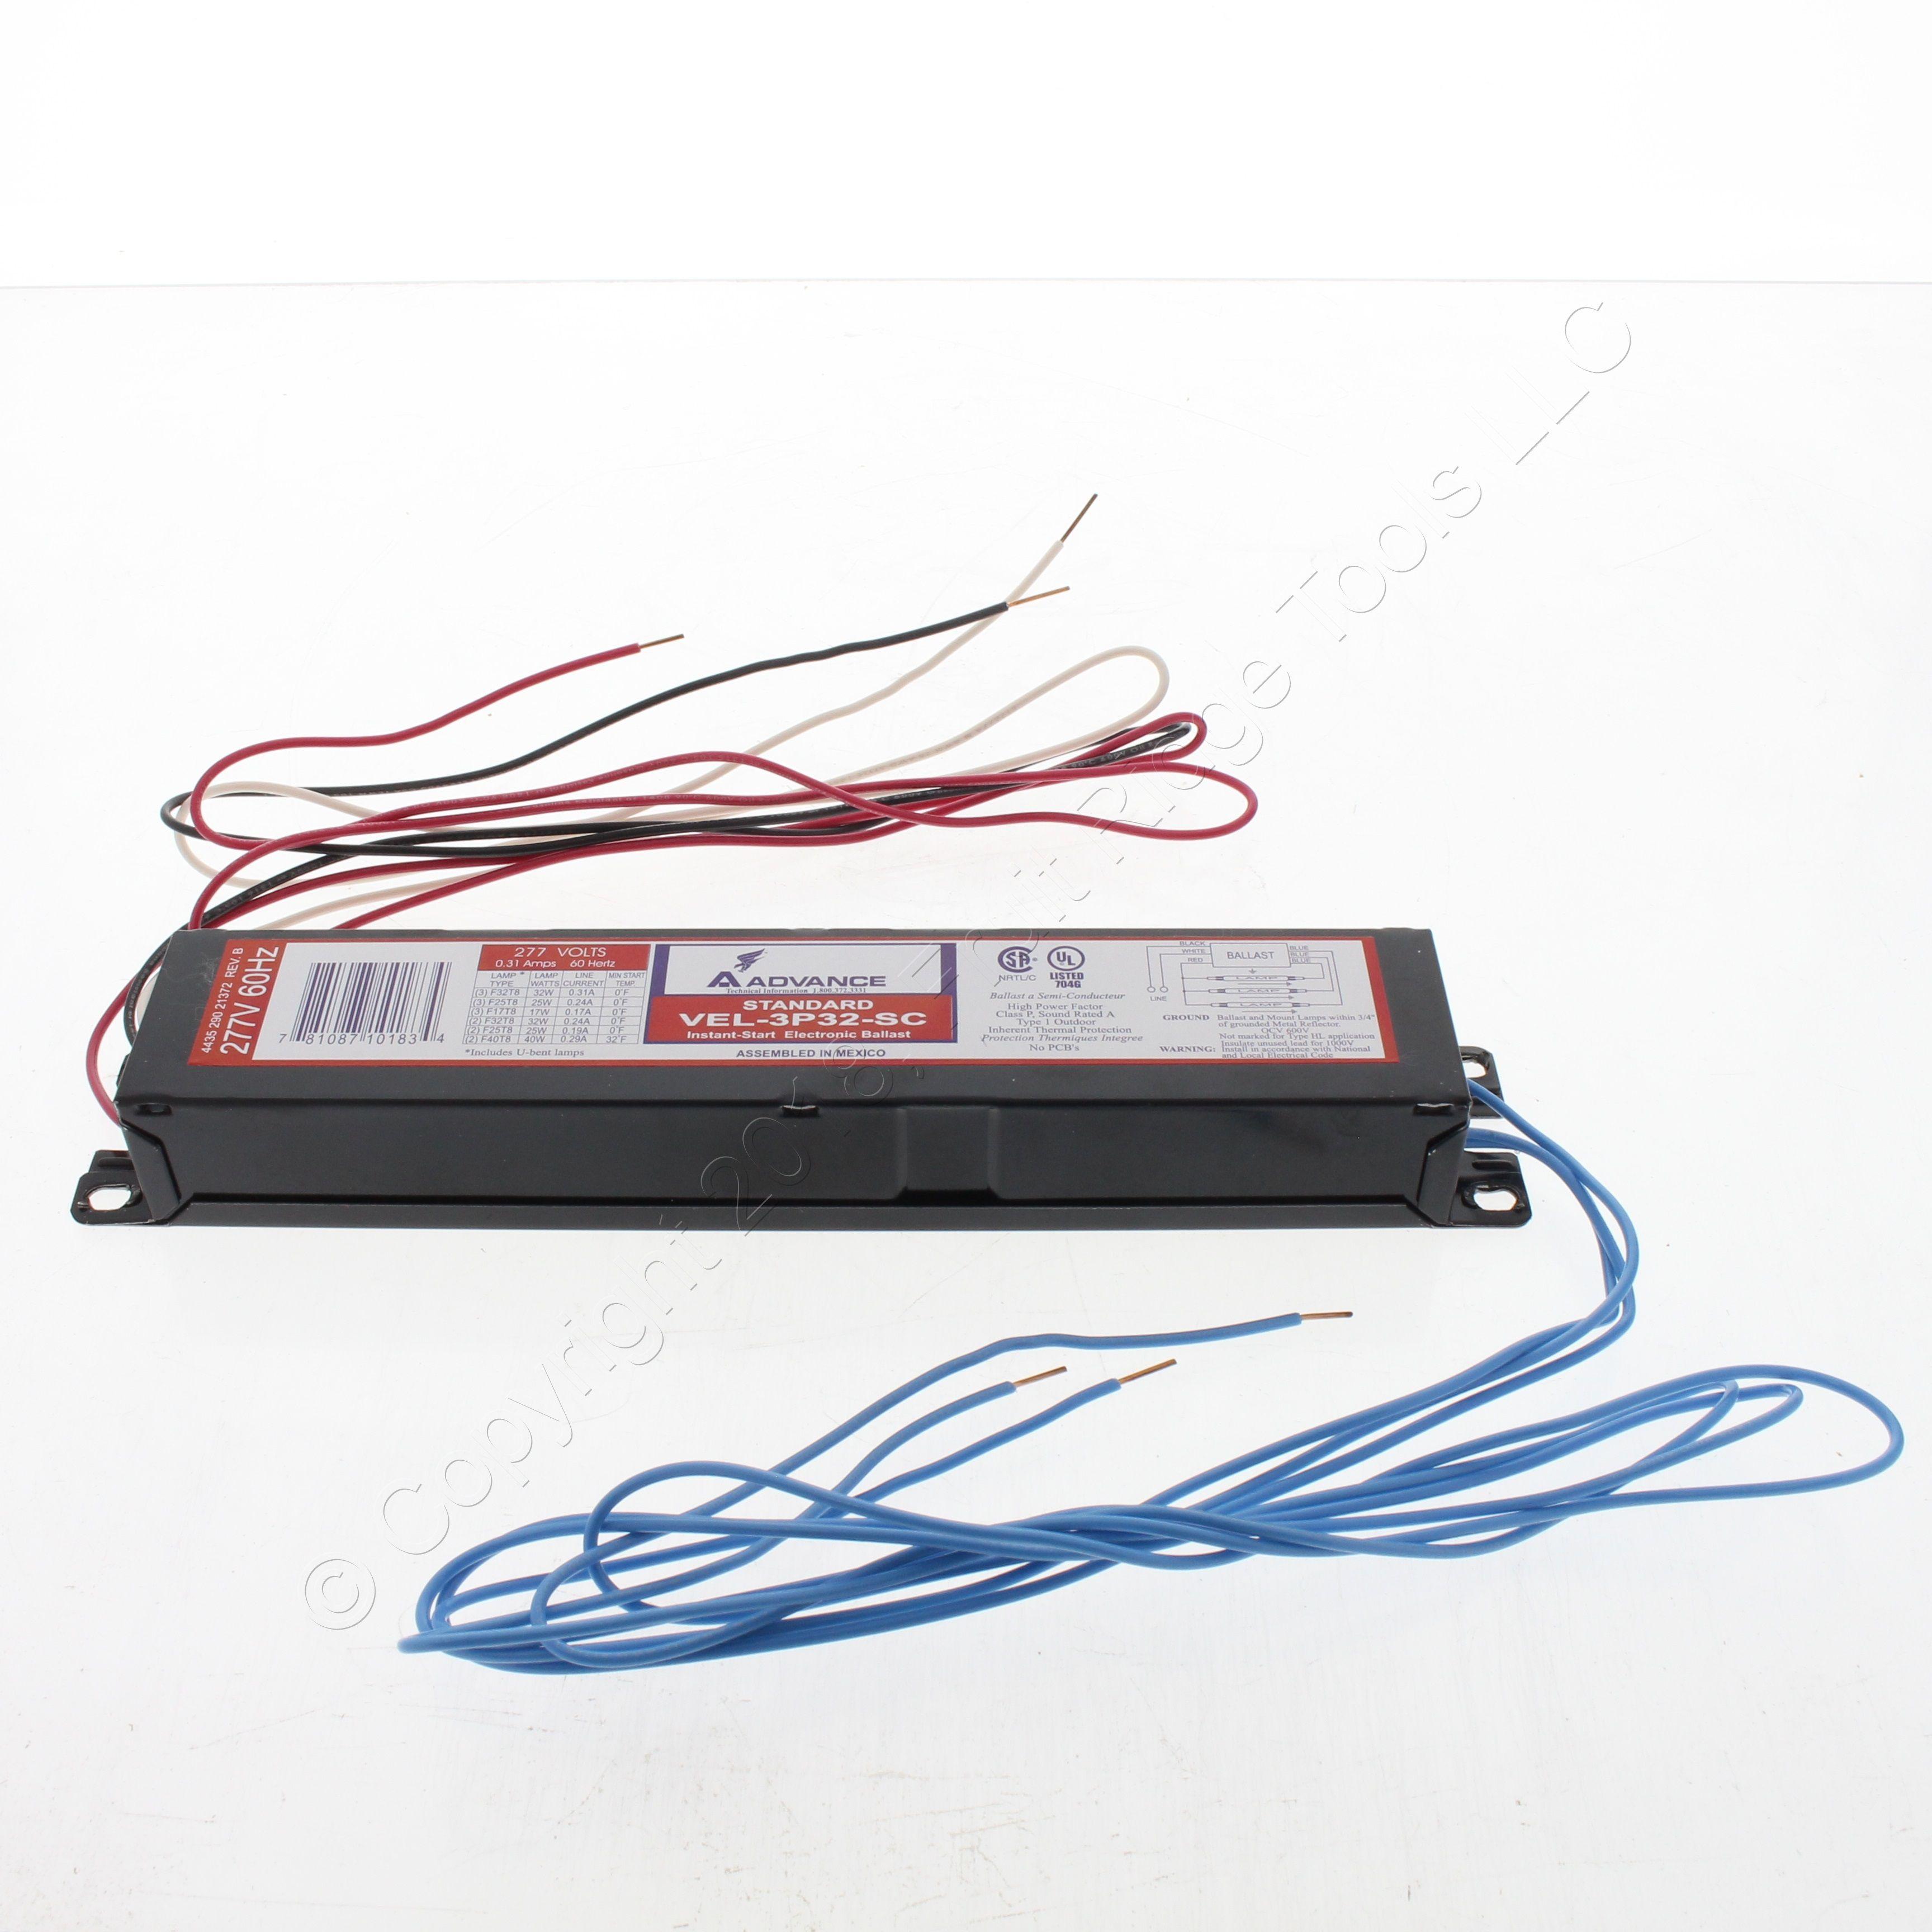 Shop New Advance 2 Lamp Instant Start 277v Electronic 277 Volt Ballast Wiring Flourescent Vel 3p32 Sc Fruit Ridge Tools